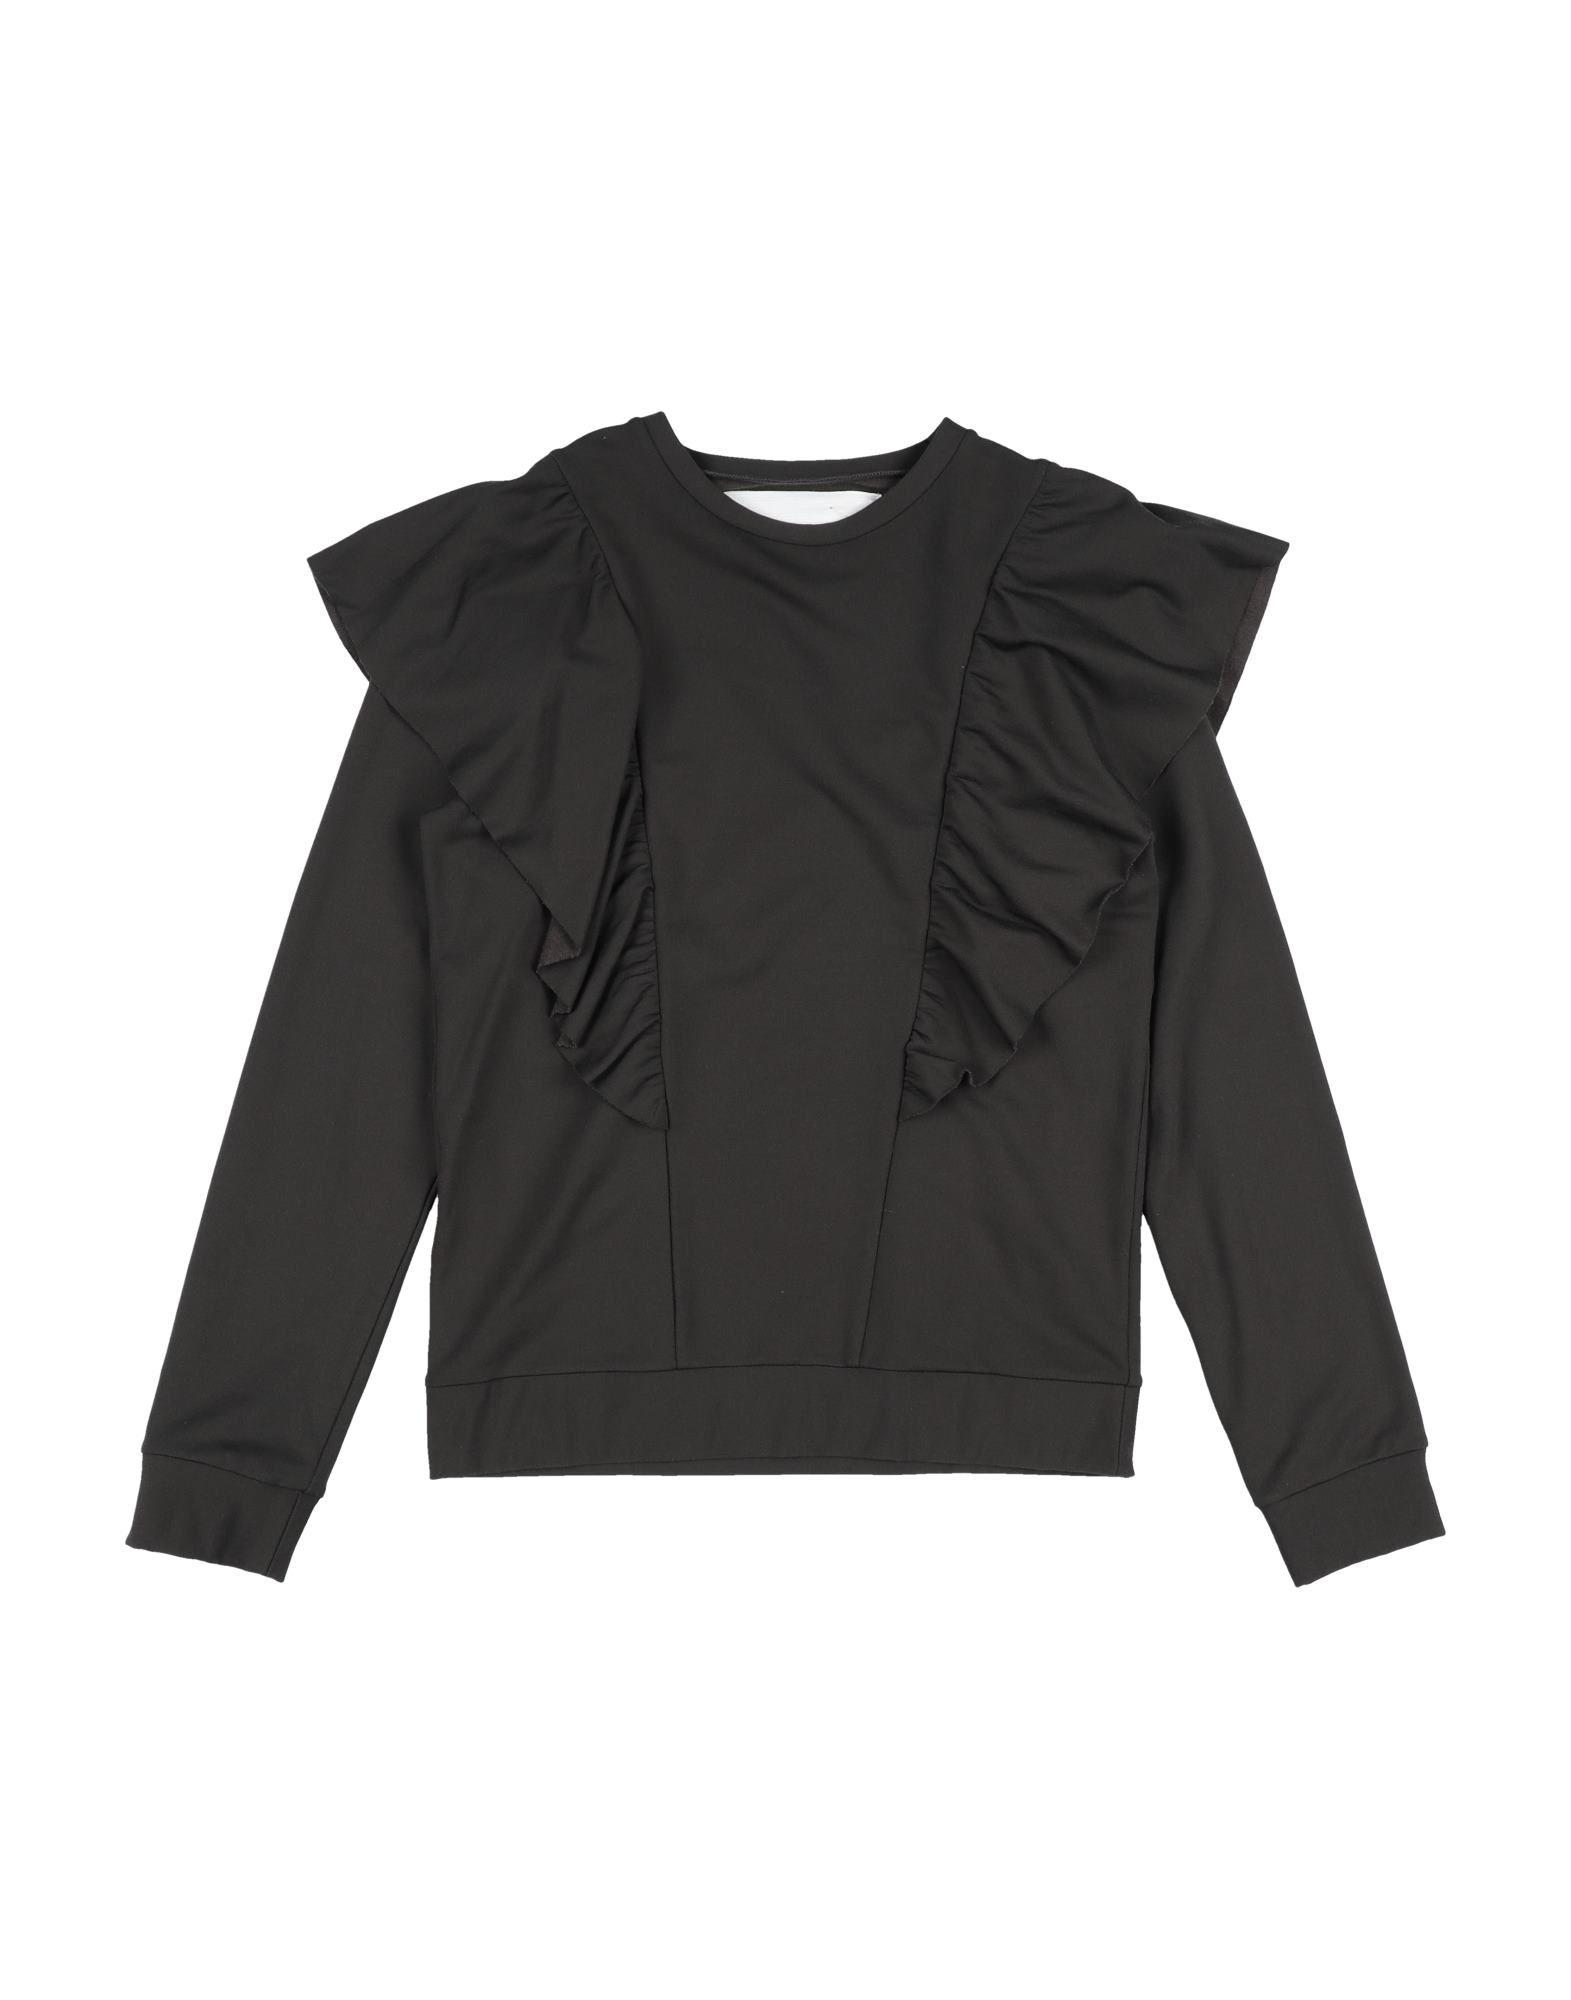 Touriste Kids' Sweatshirts In Black